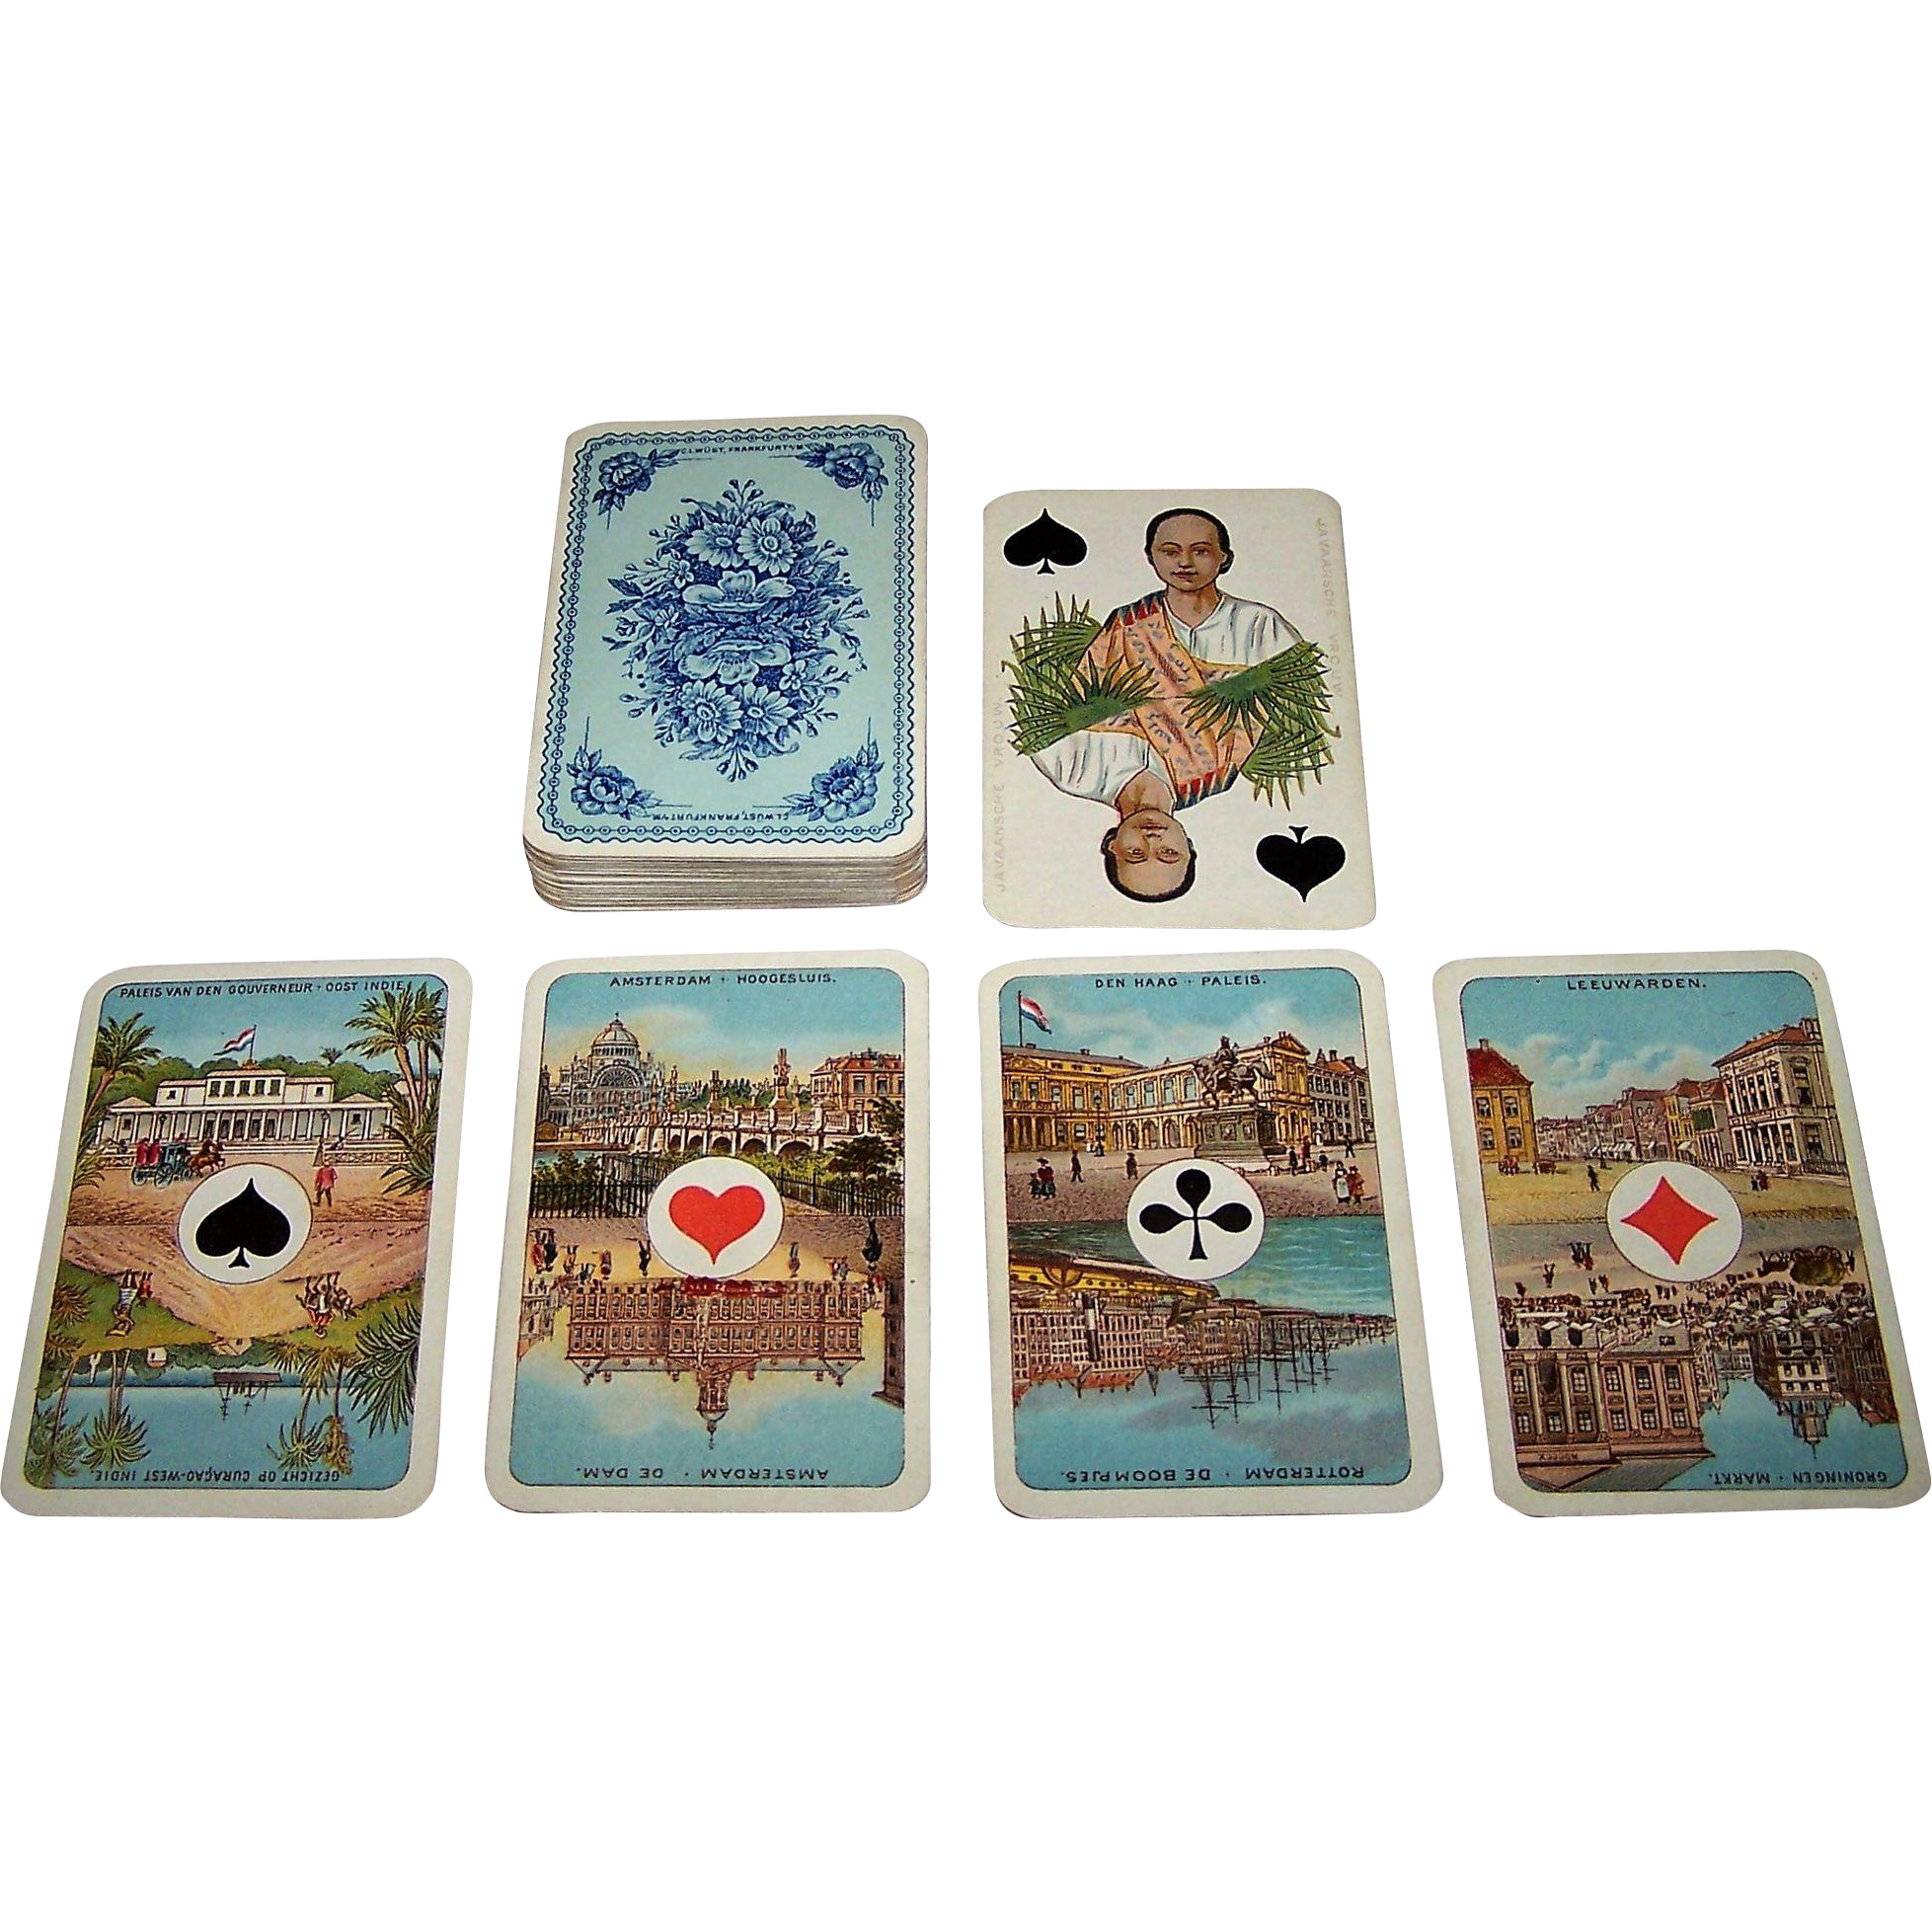 "C.L. Wüst ""Wilhelmina"" Playing Cards, Ascendancy of Queen Wilhelmina, c.1890"